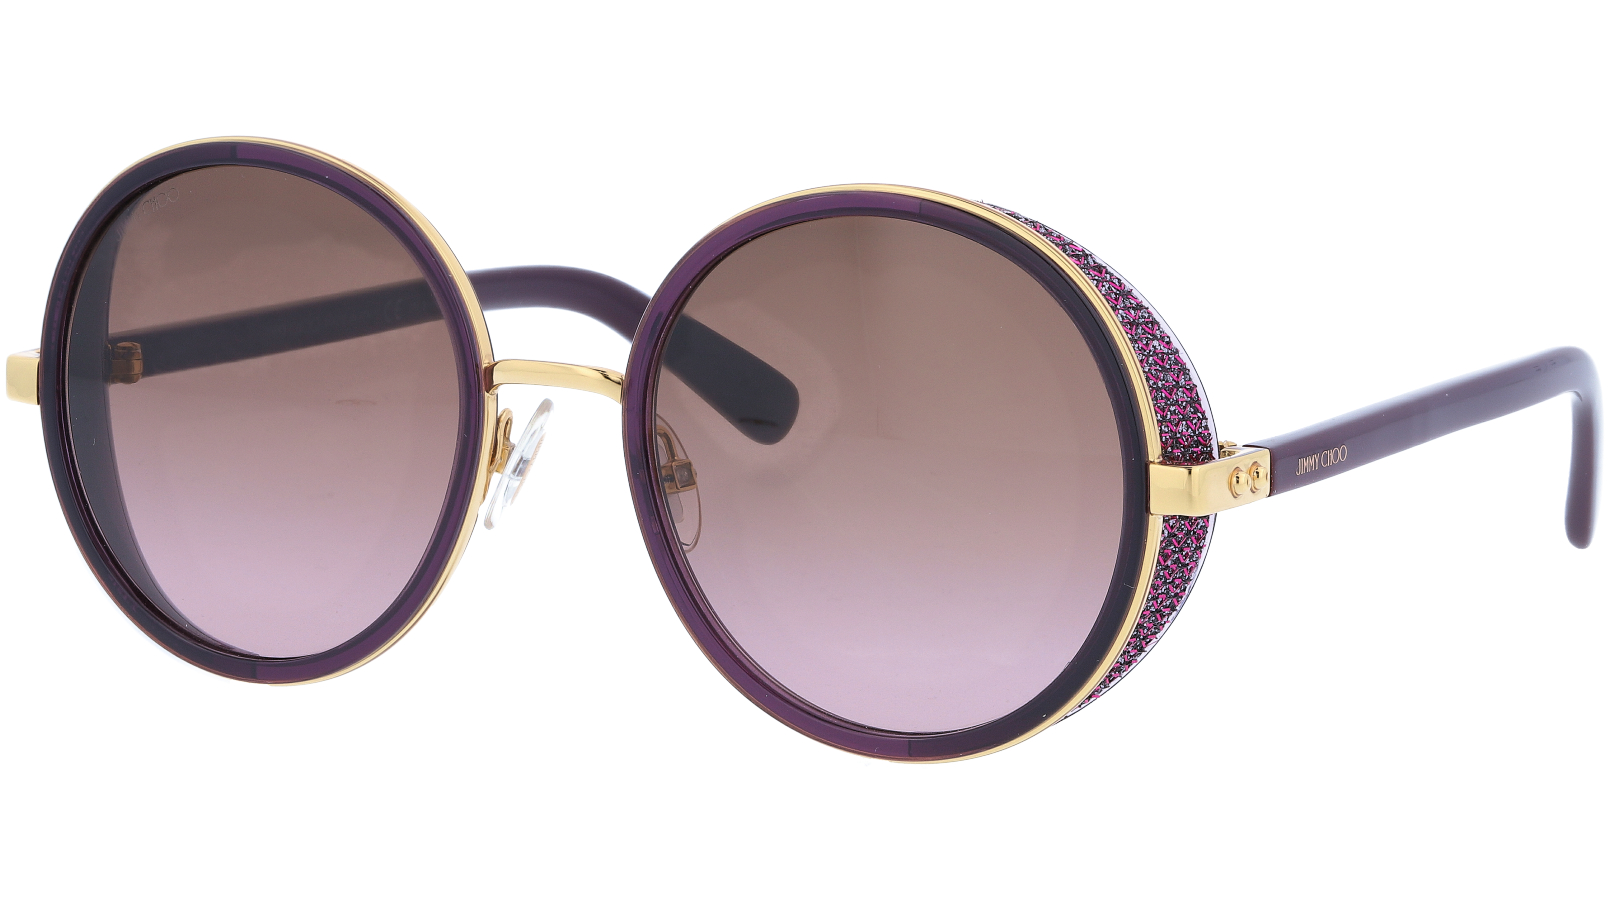 JIMMY CHOO ANDIENS 1KJV6 54 GOLD Sunglasses